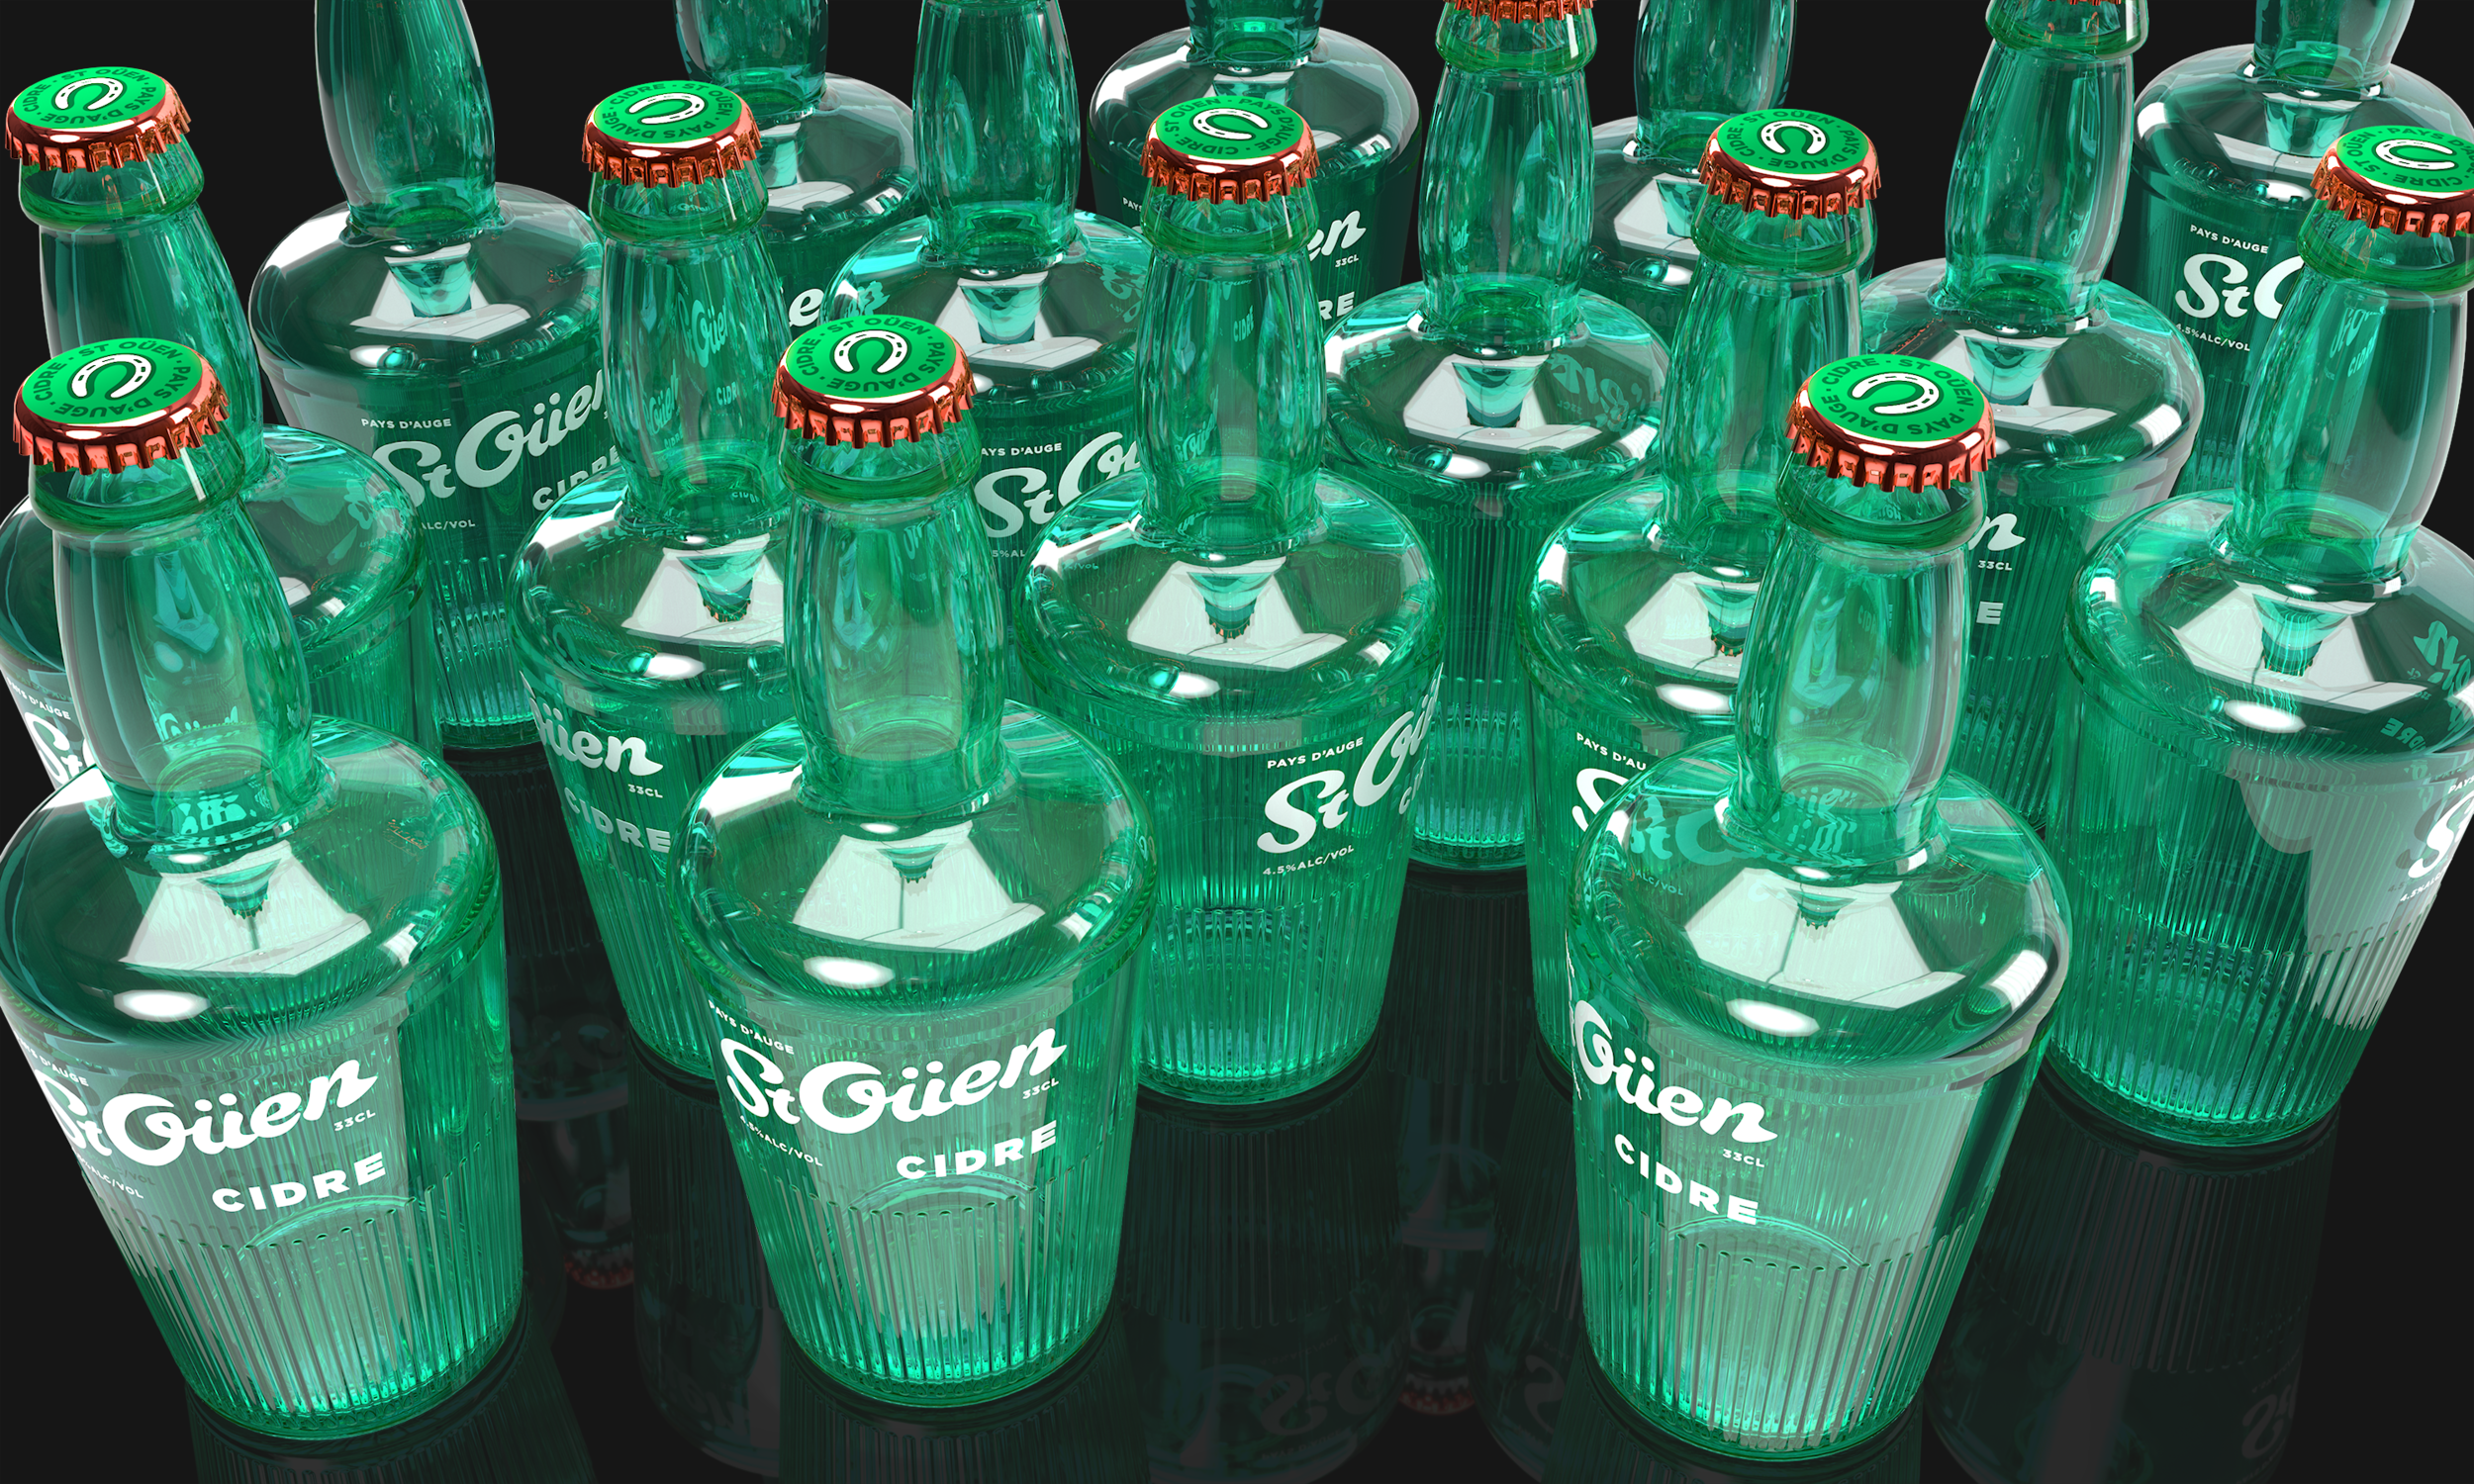 2.027-StOTurquoise-bottle-snapshot2.png